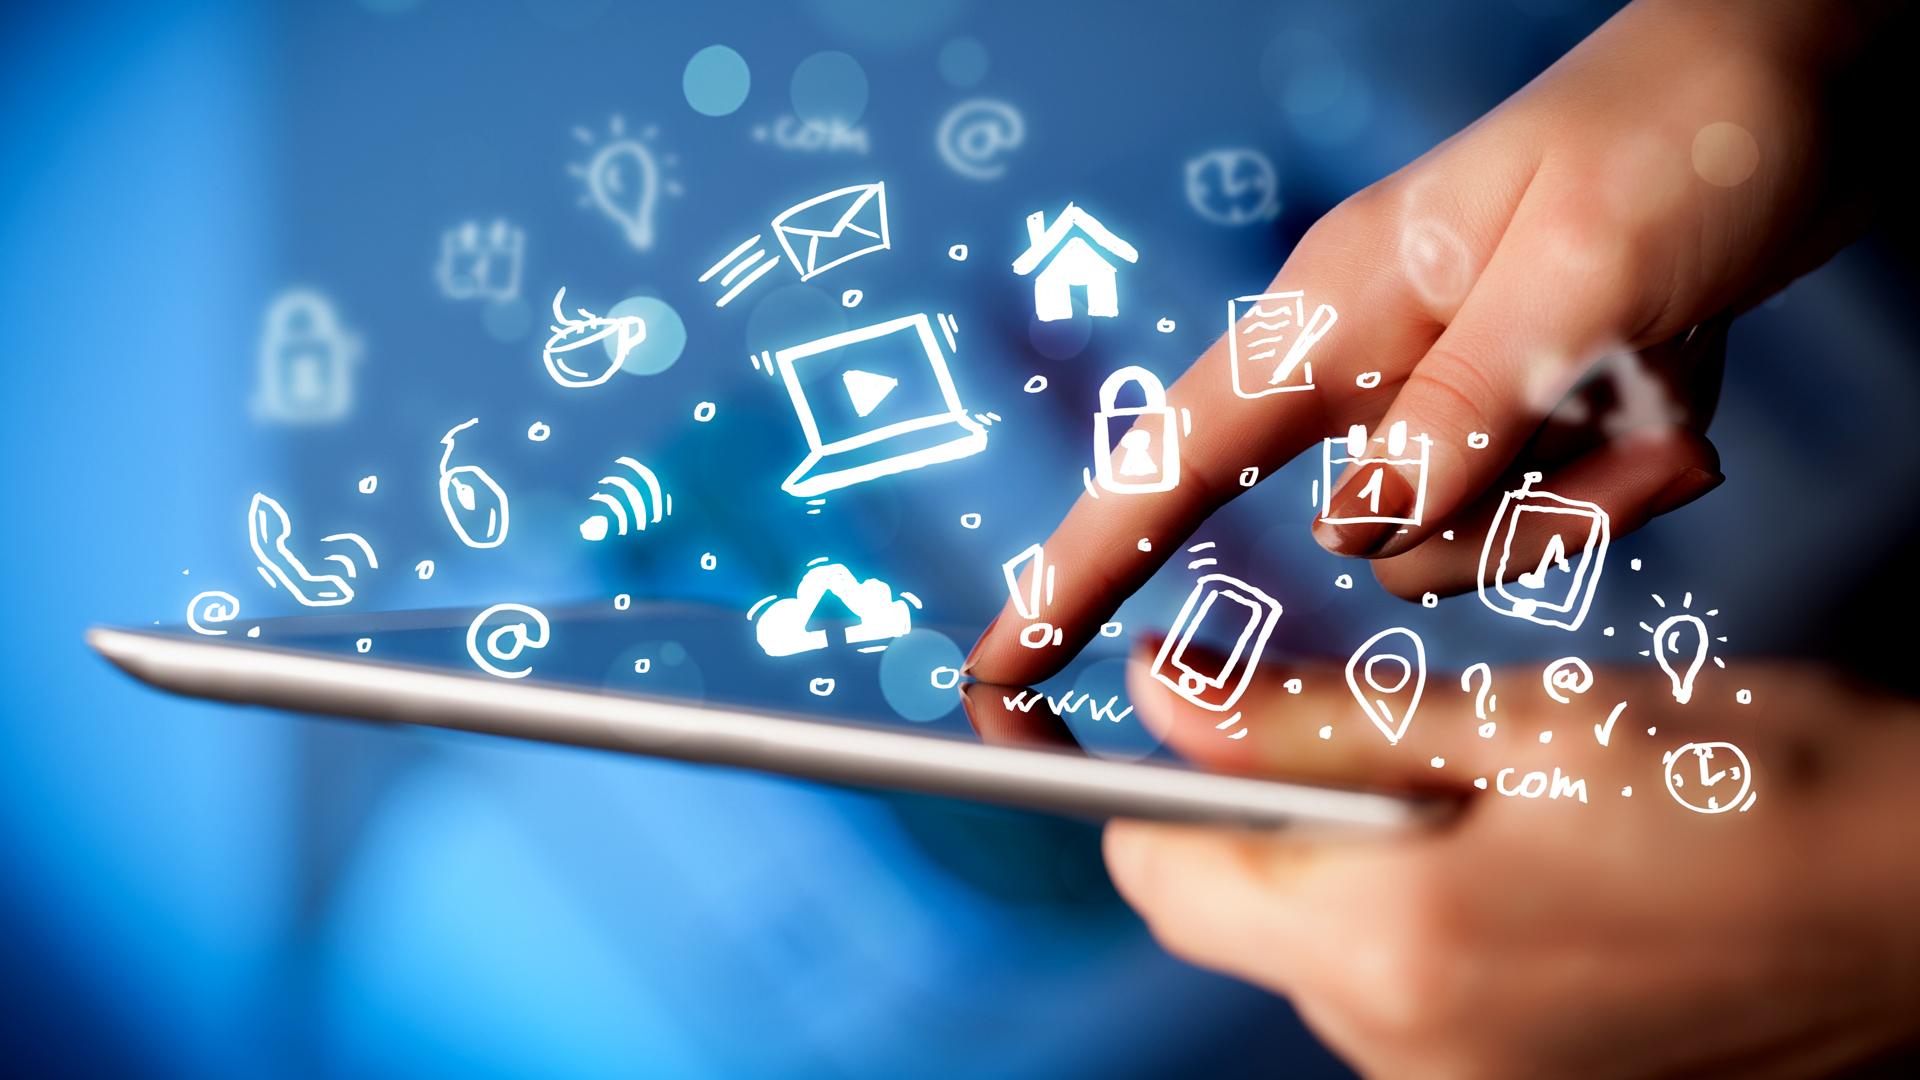 What Makes A Brand Digital Durable